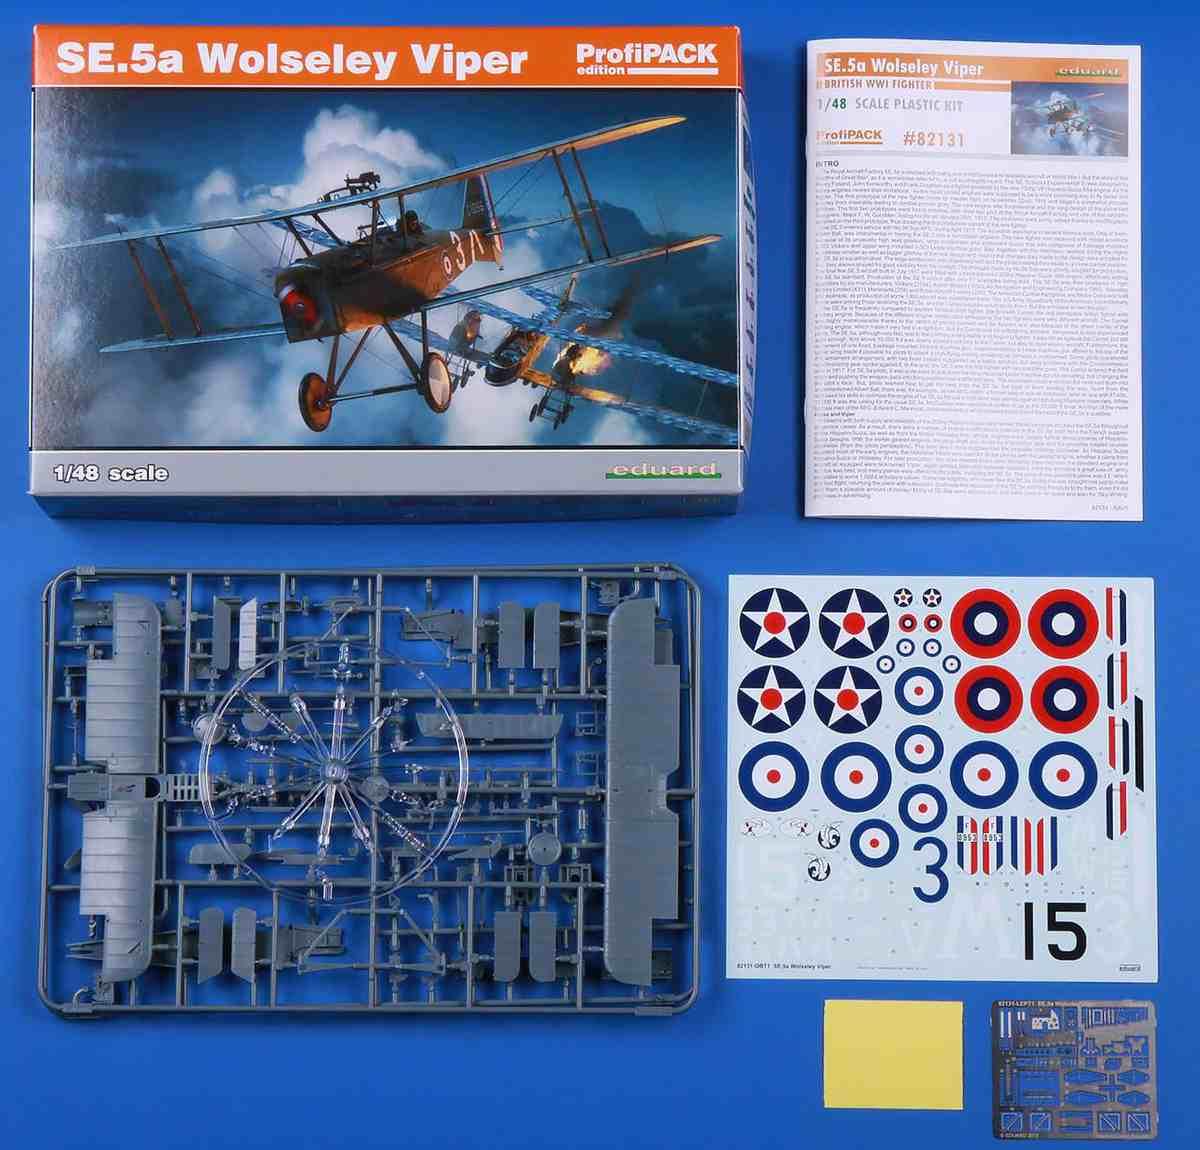 Eduard-82131-SE.5a-Wolseley-Viper-Bausatzinhalt Die neue SE.5a Wolseley Viper von Eduard in 1:48 (# 82131 )